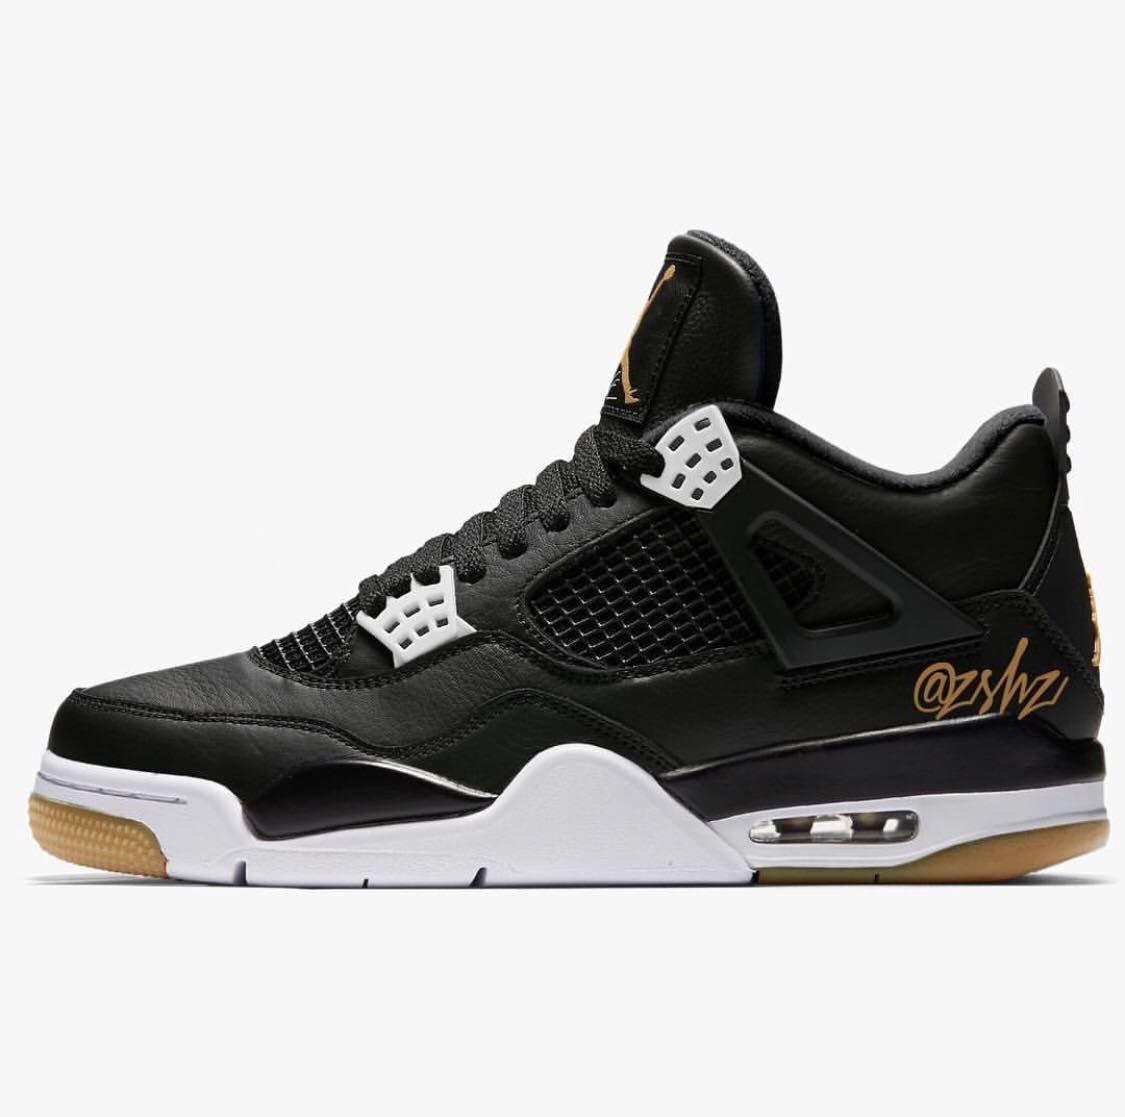 08b65a58c44 Air Jordan 4 SE Color  Black White-Gum Light Brown Release Date  January  19